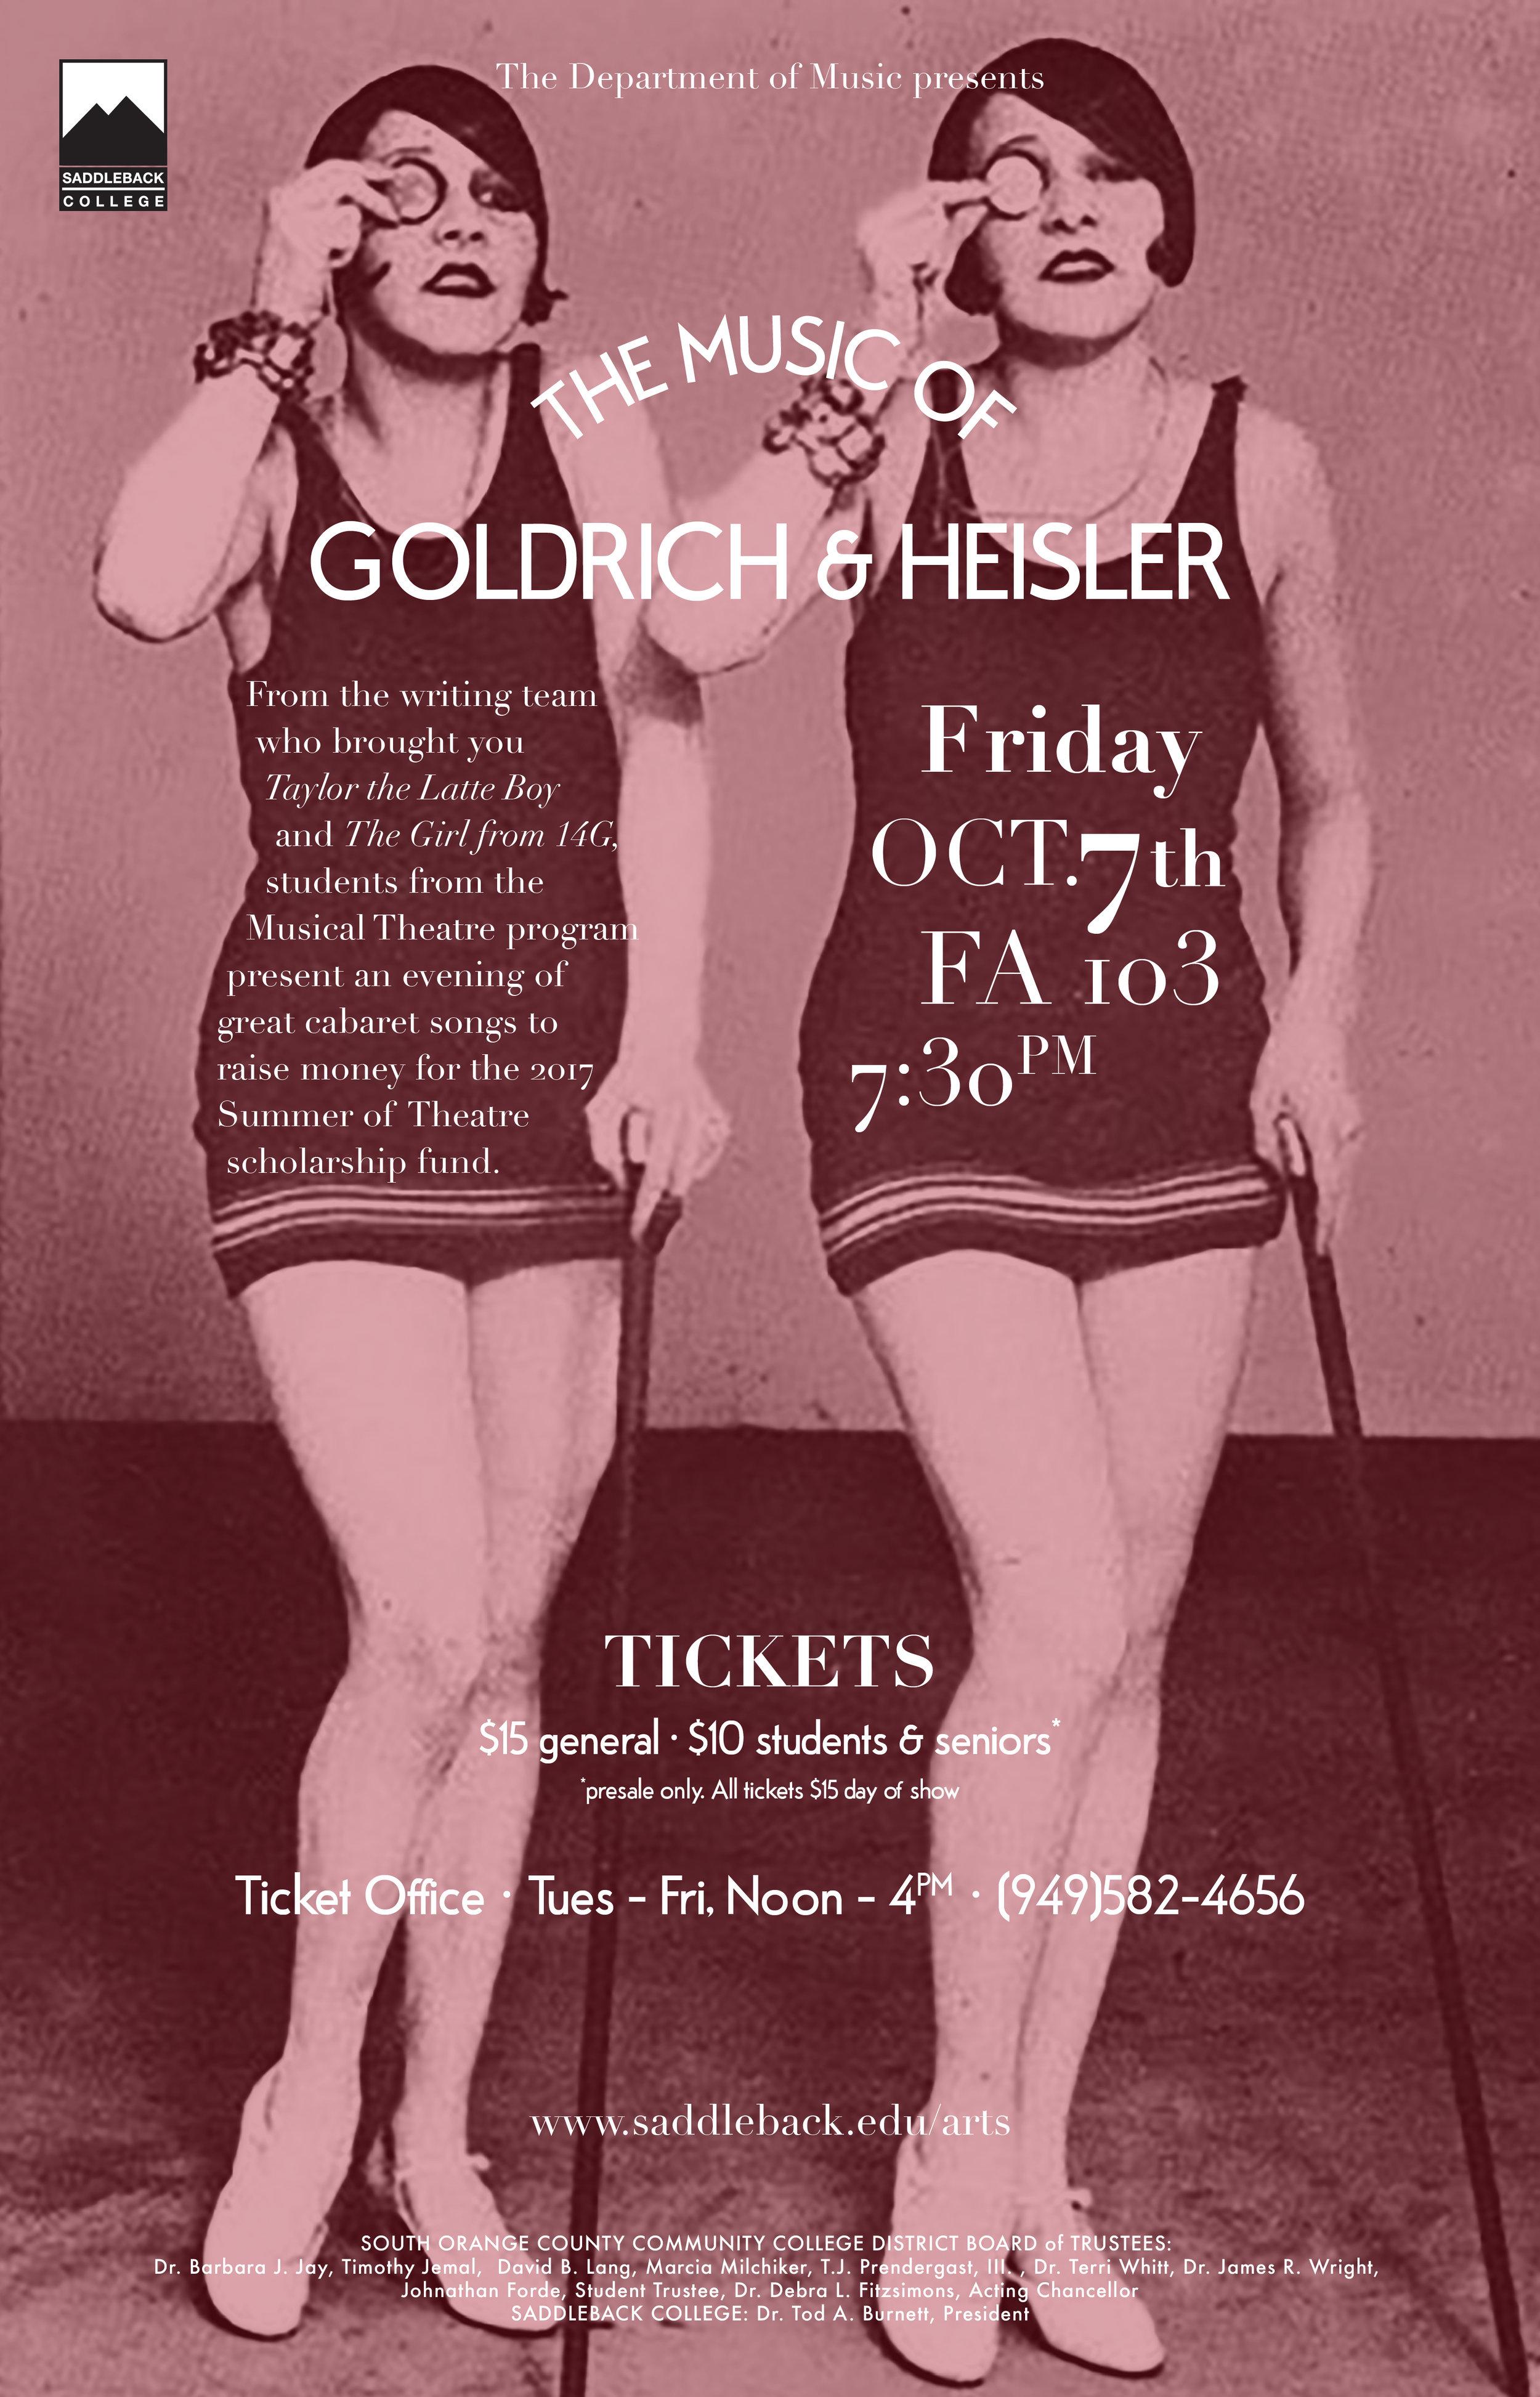 goldrichheisler-pink-dollysisters.jpg